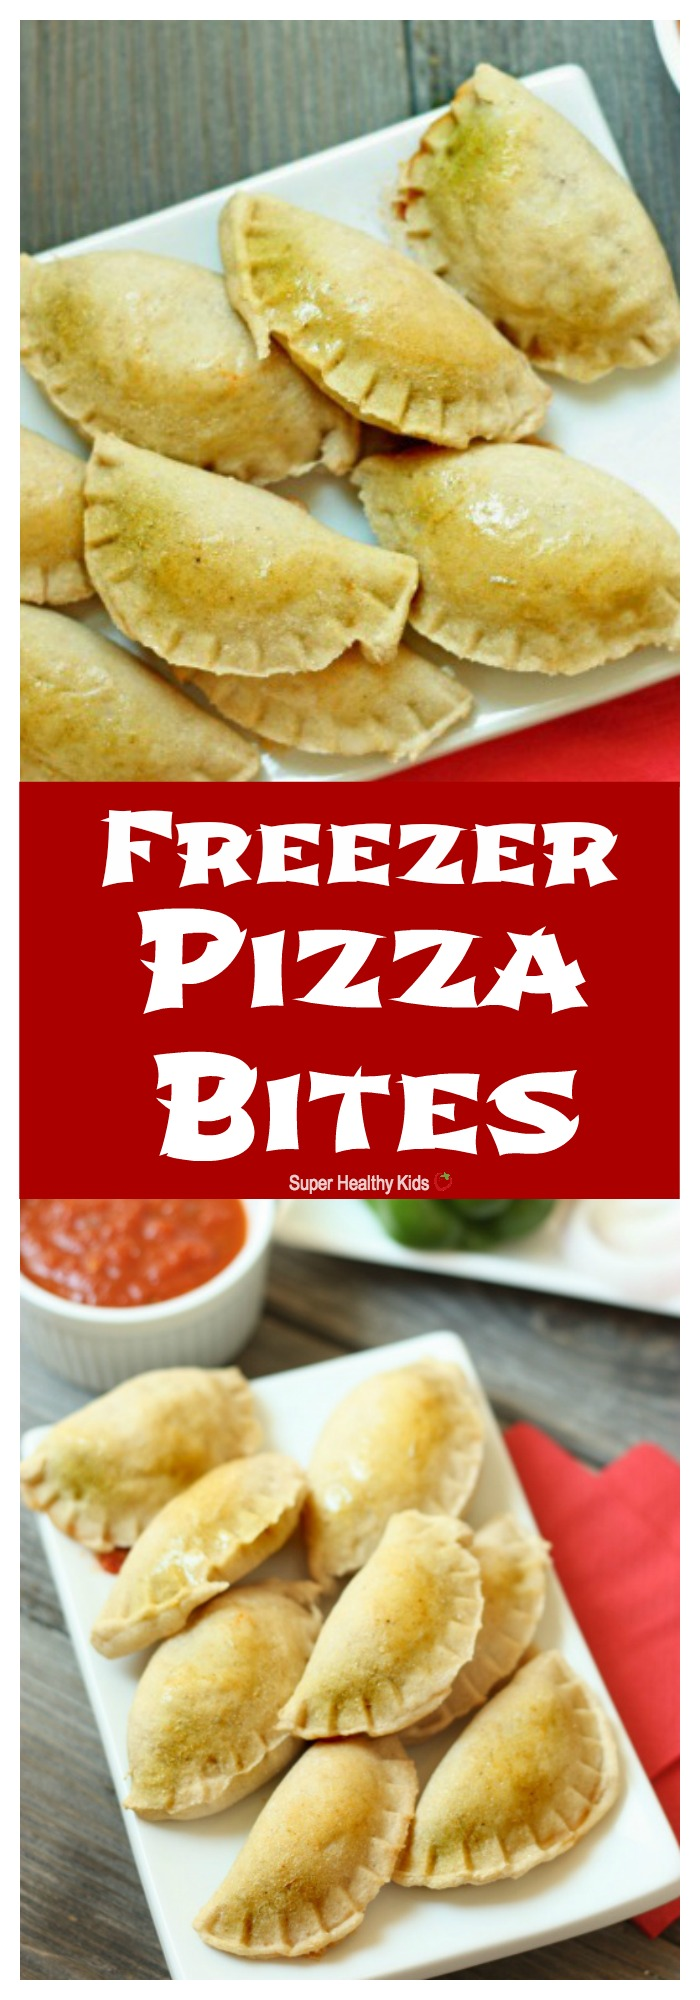 FOOD - Freezer Pizza Bites. Bite size dinner, with giant size nutrition! http://www.superhealthykids.com/freezer-pizza-bites/